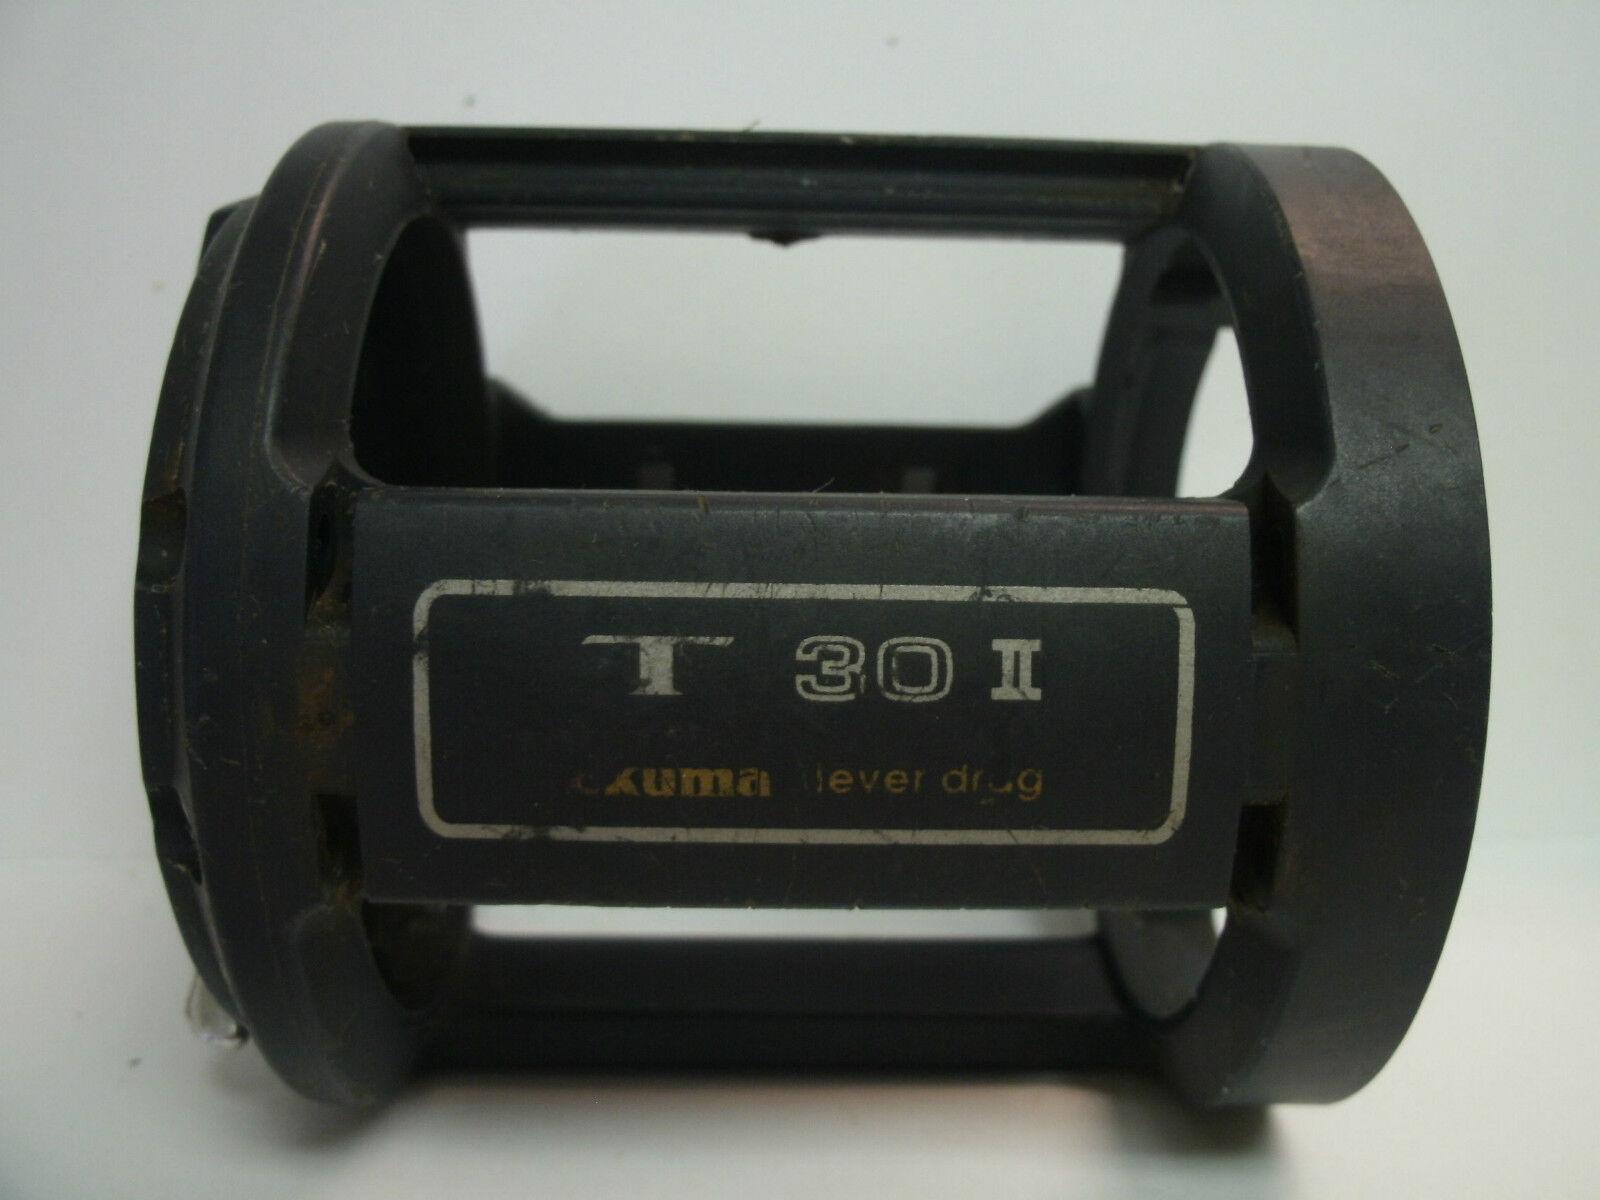 VERWENDETES OKUMA REEL TEIL - Titus T30 II 2 Speed Big Game - Frame Assembly